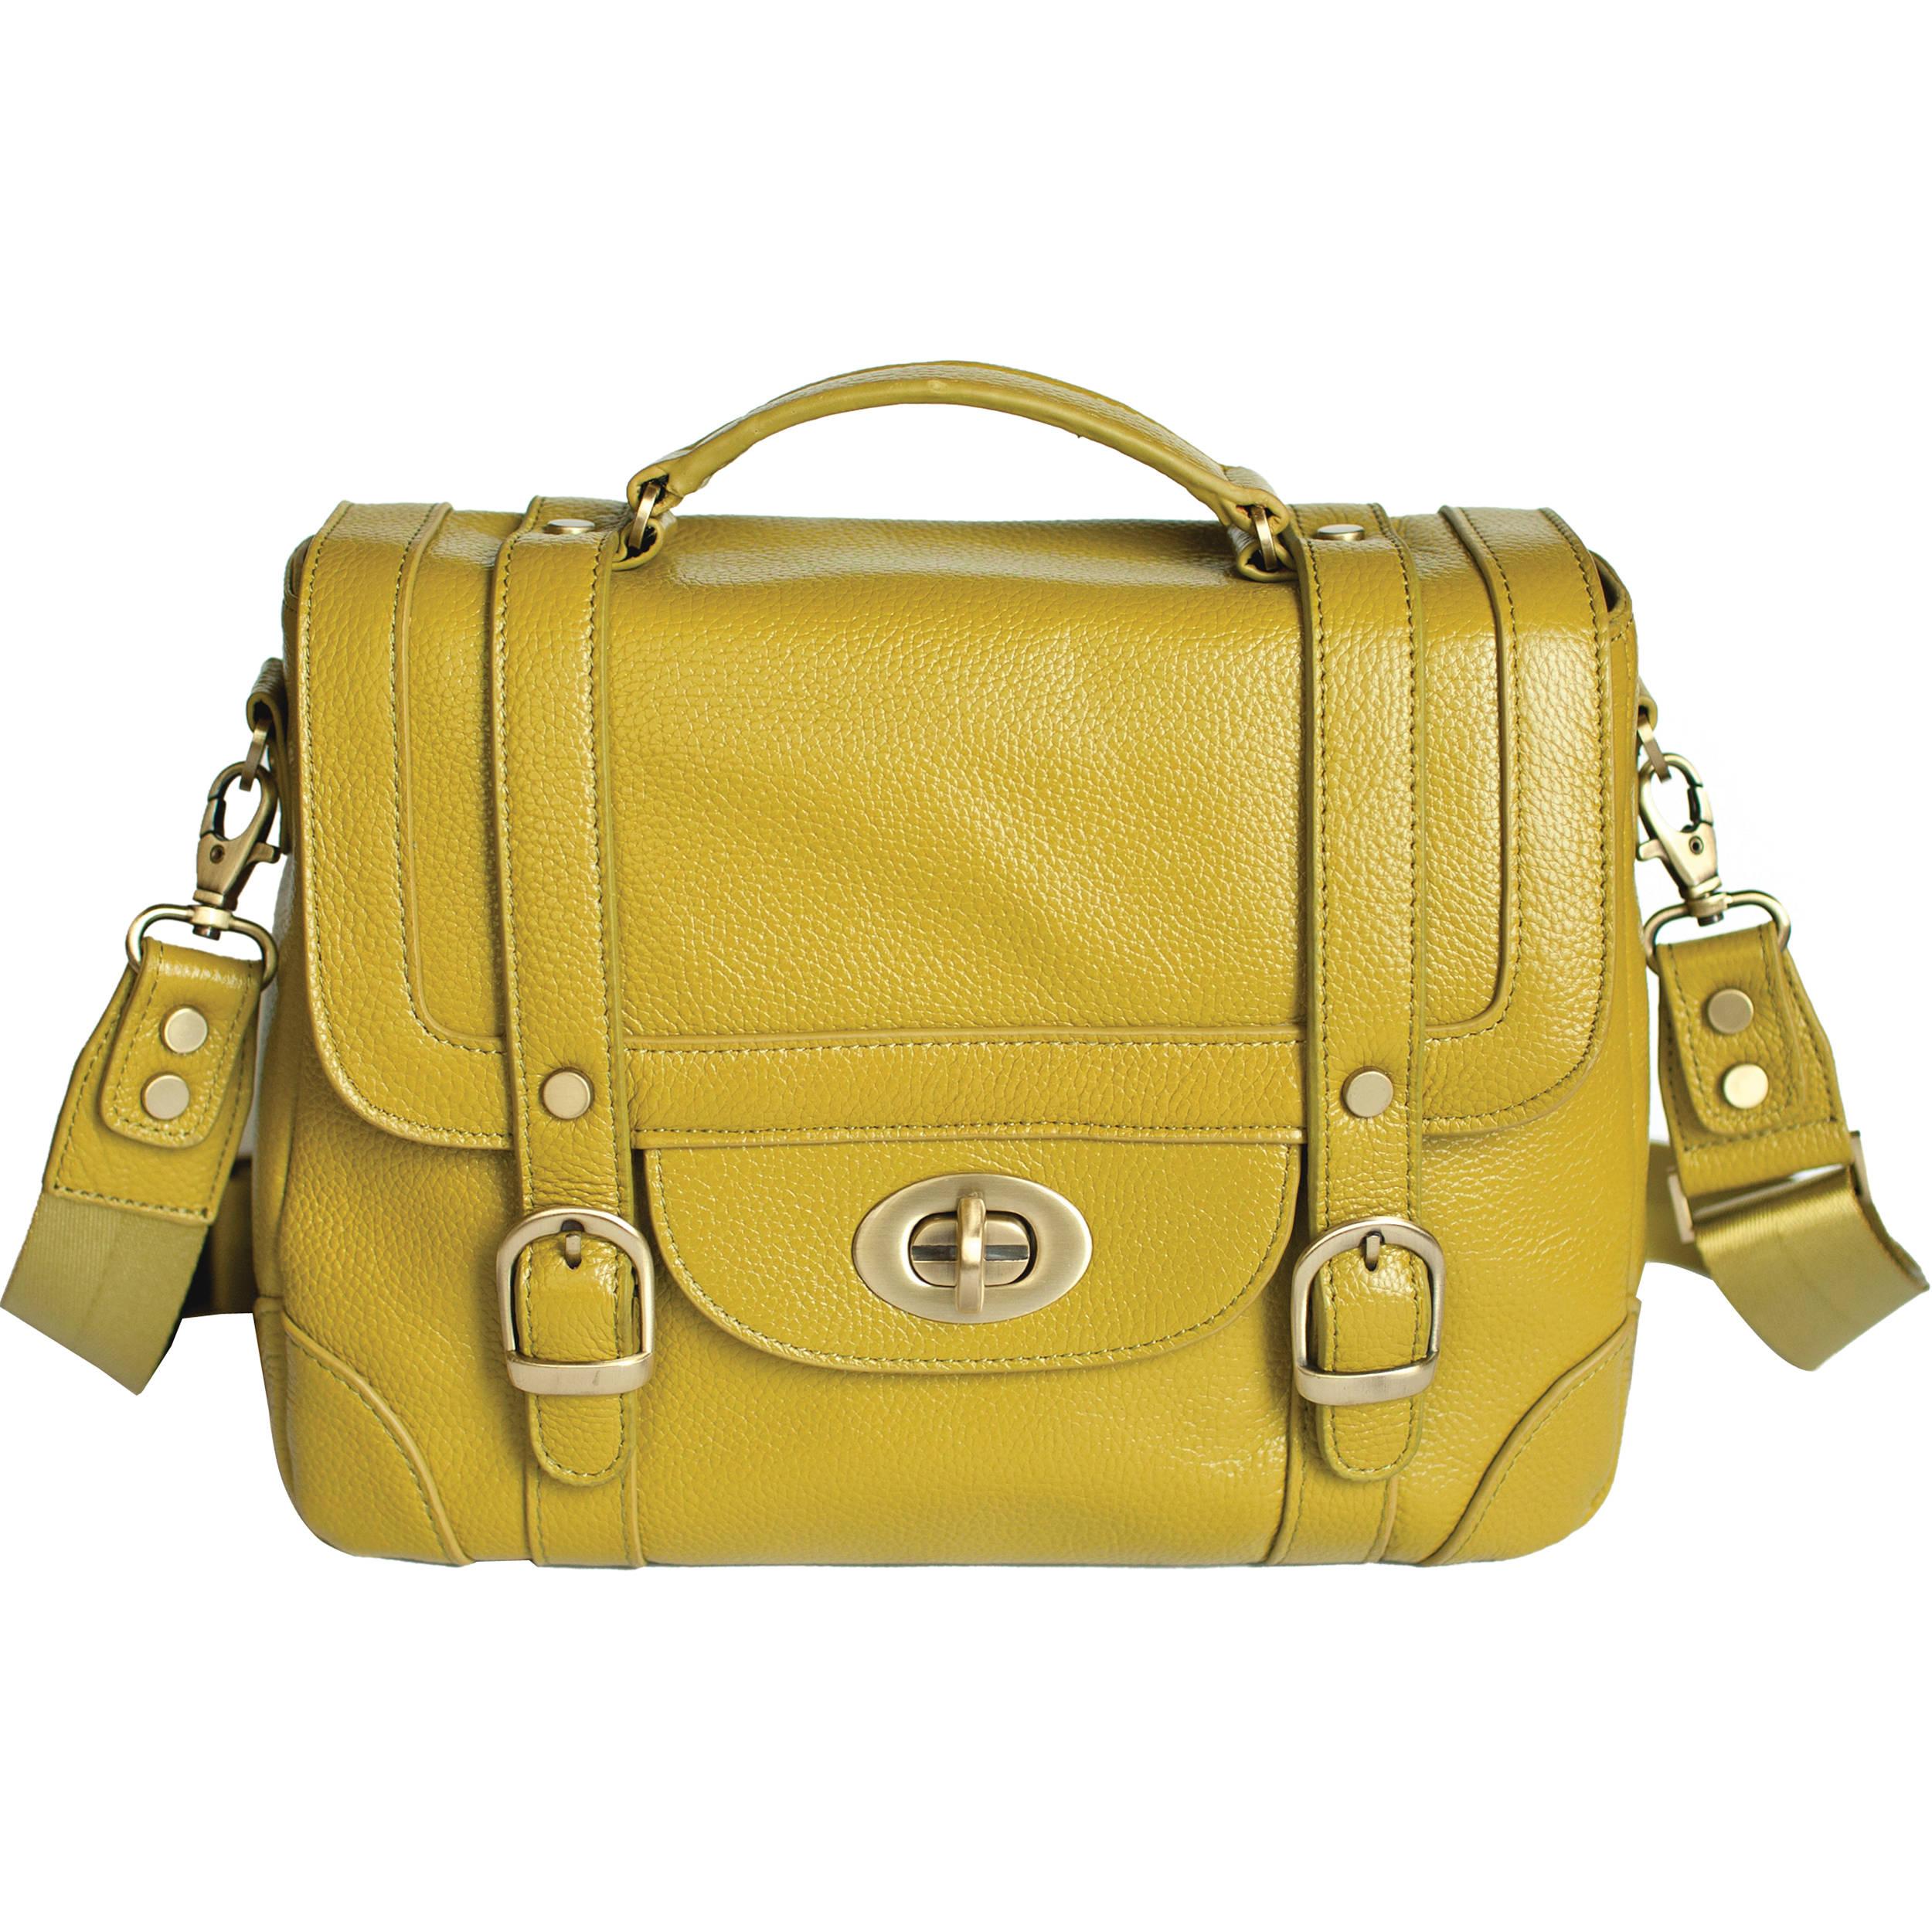 Ketti Handbags The School Camera Bag Moss Green